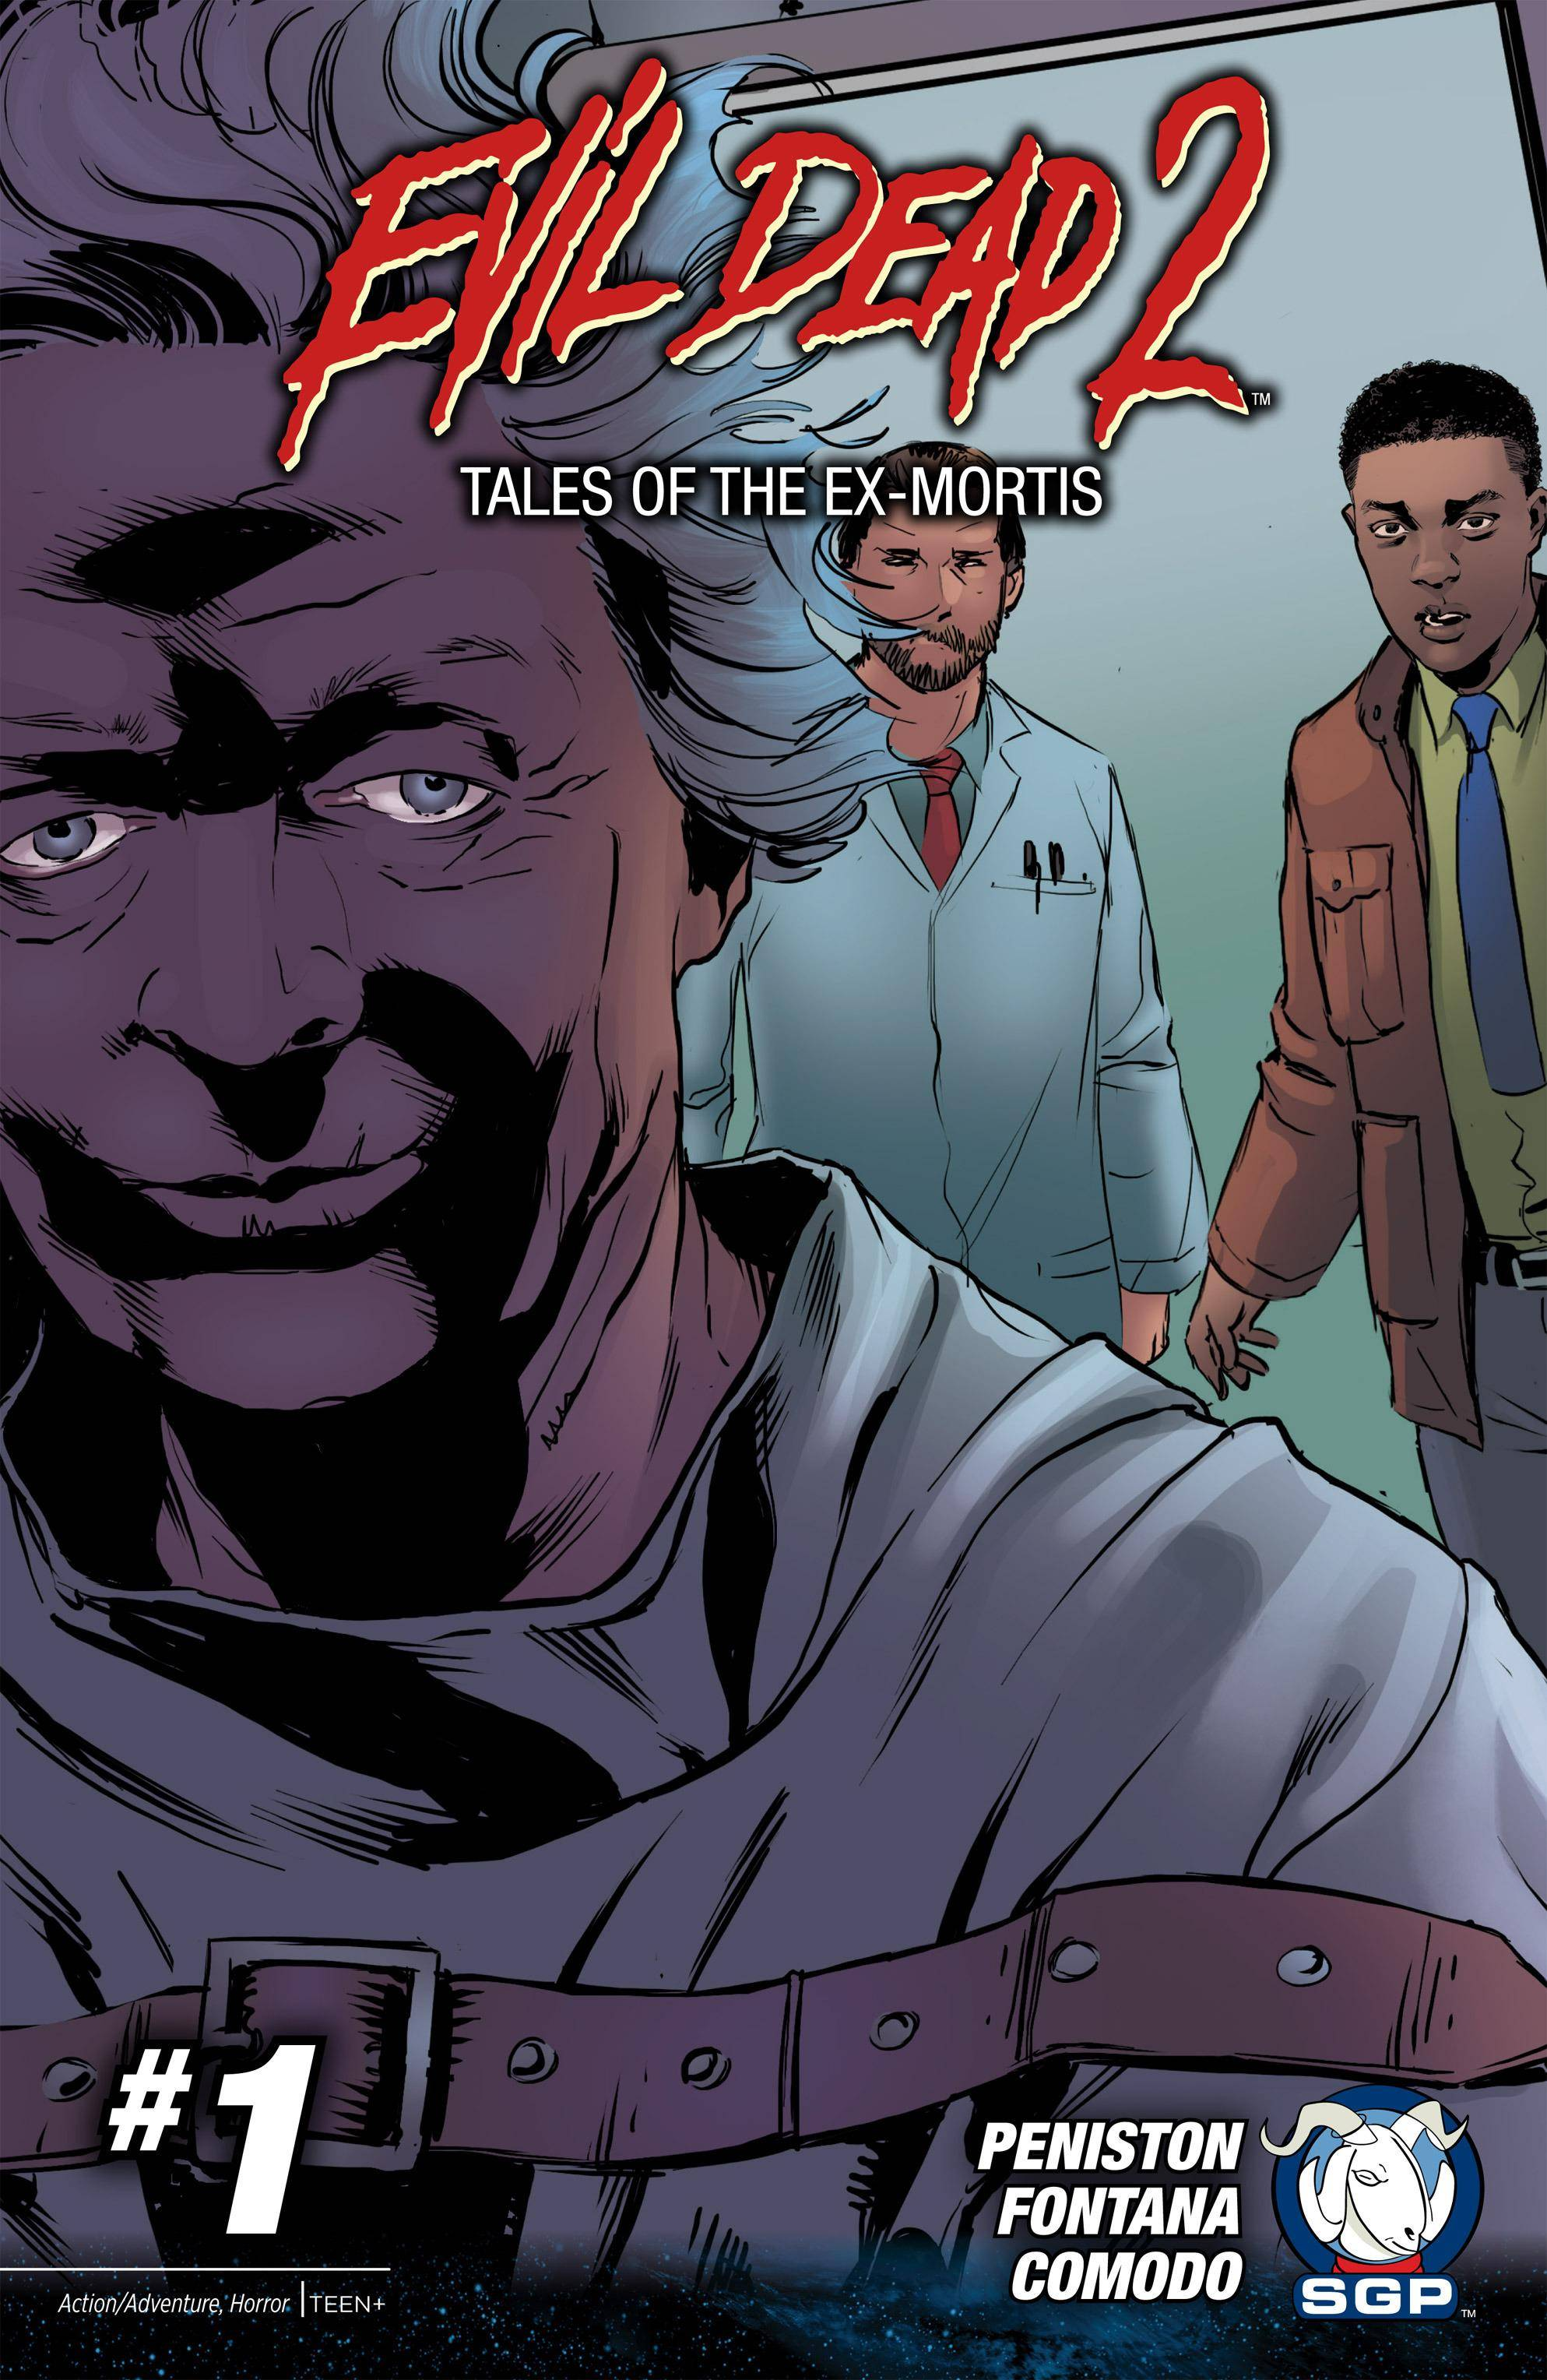 Evil Dead 2 Tales Of The Ex-Mortis 0012015DigitalTLK-EMPIRE-HD